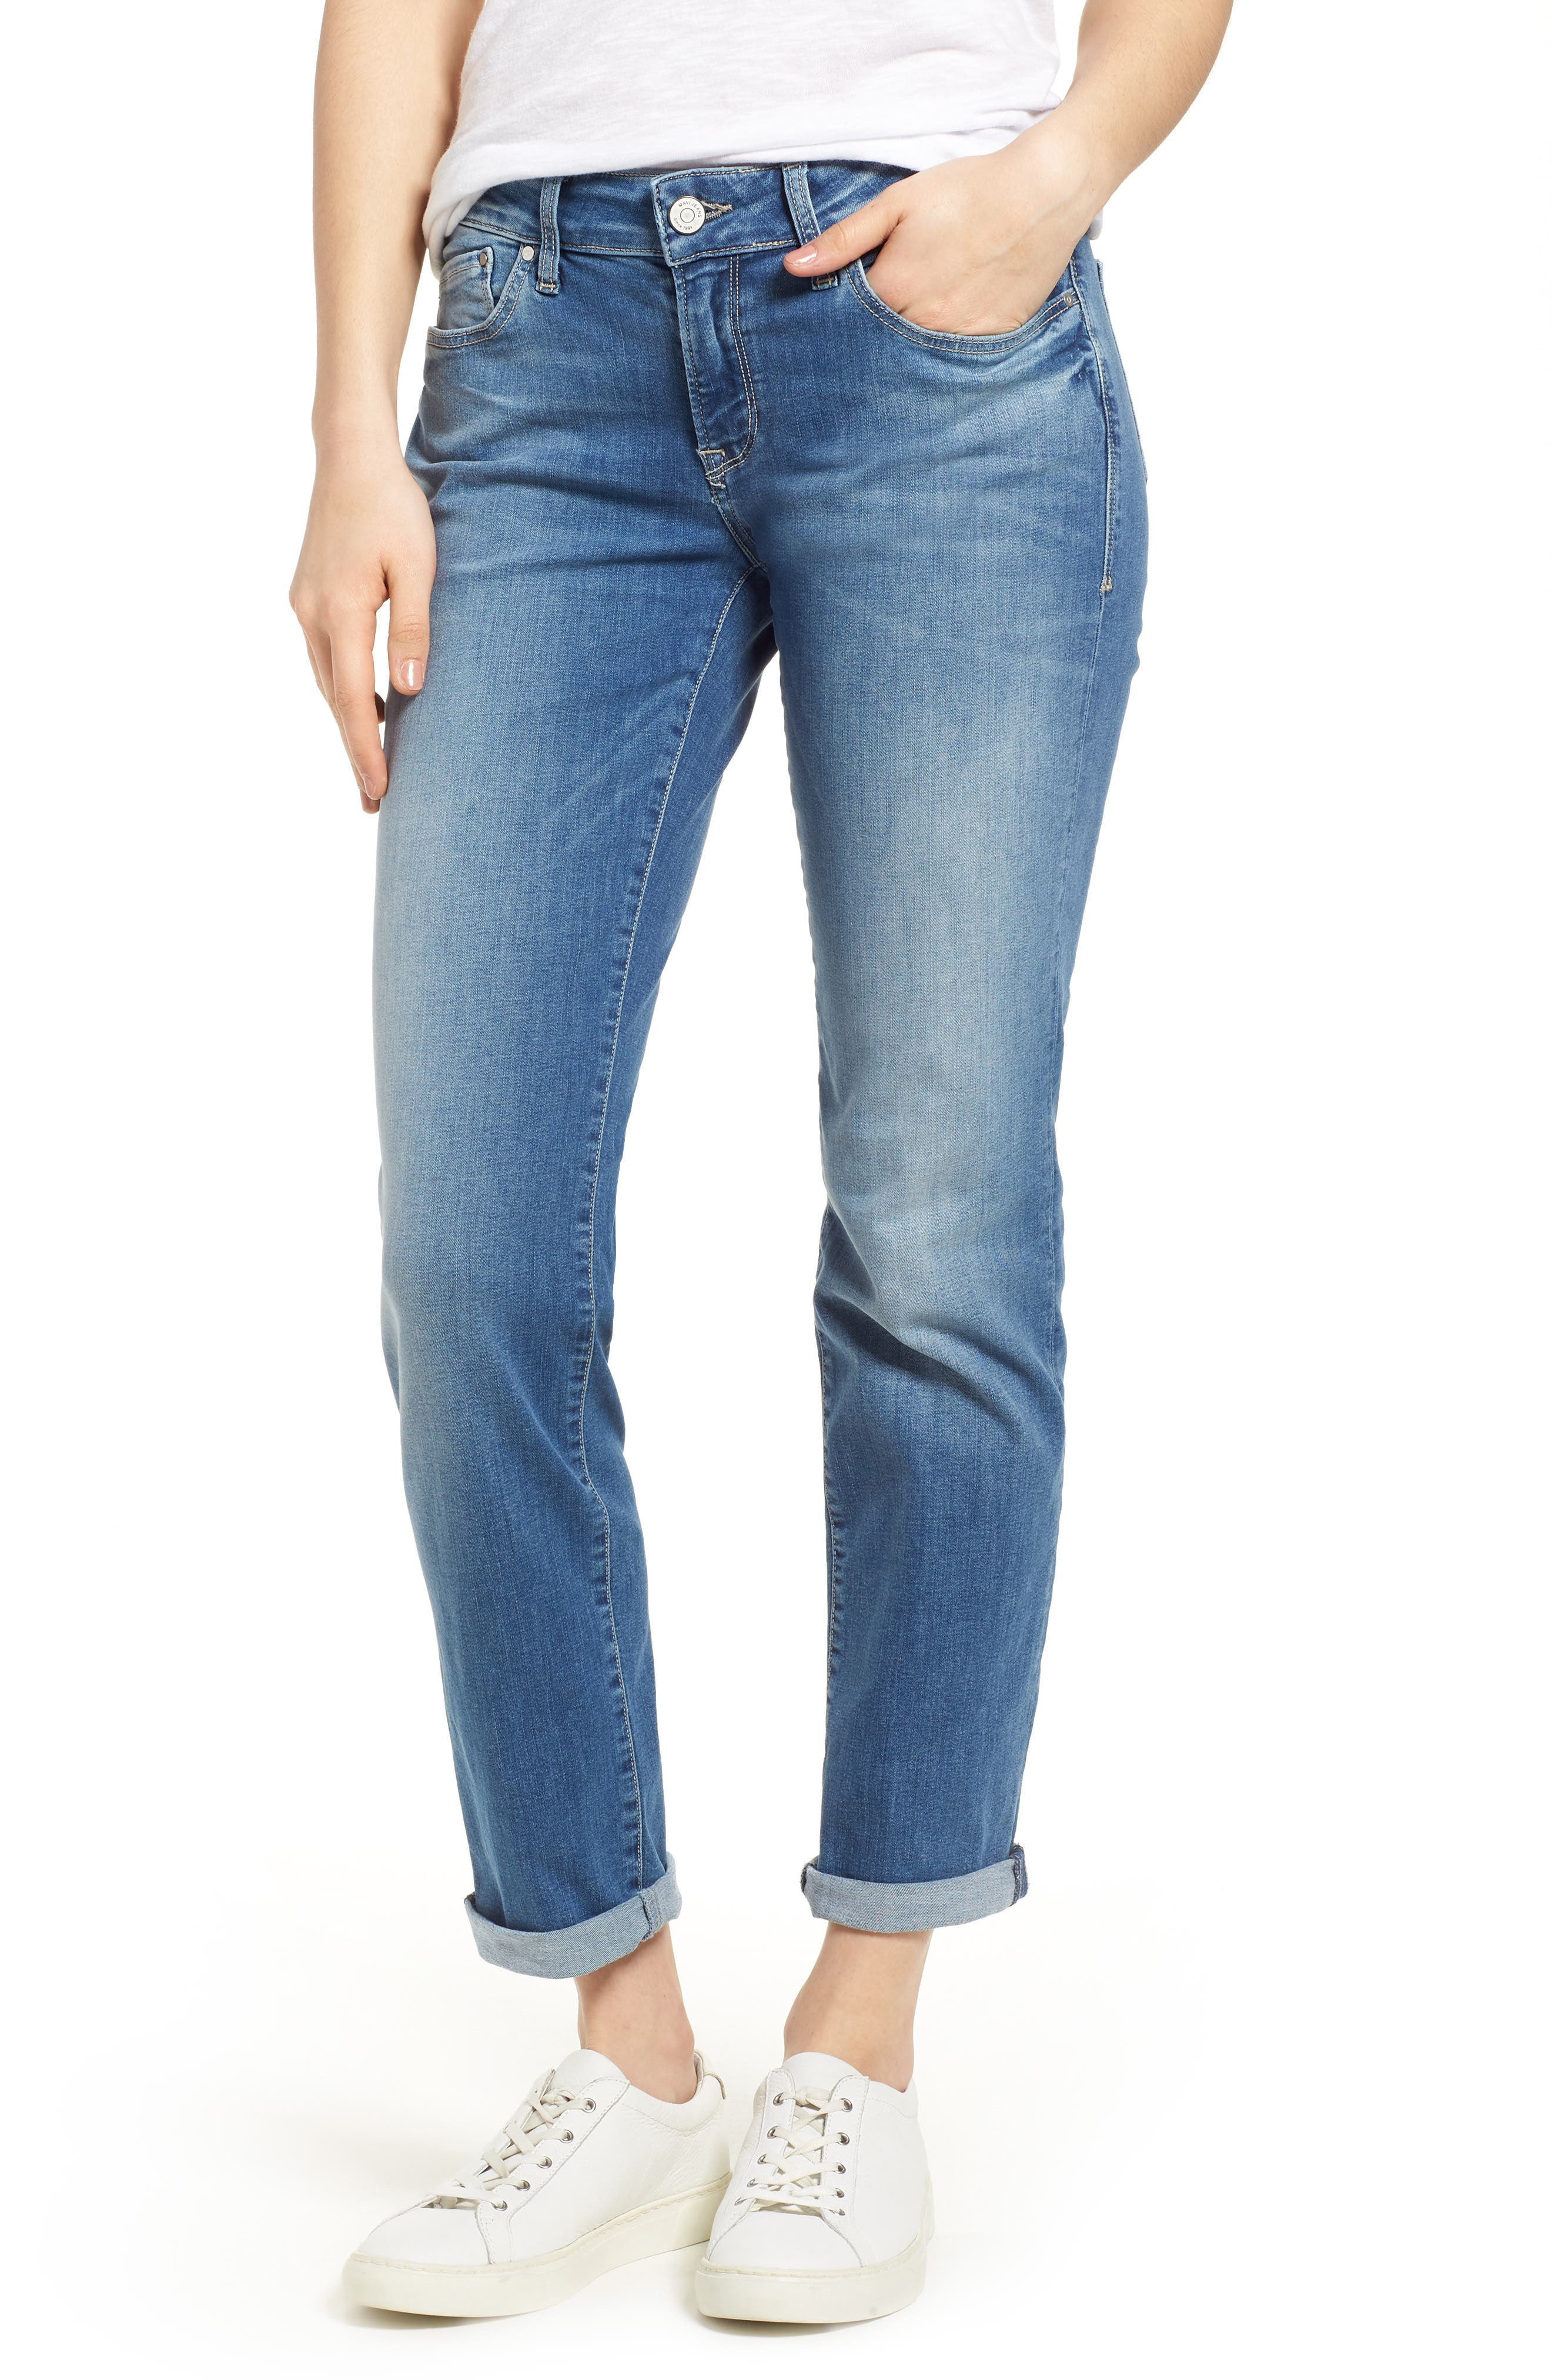 MAVI JEANS Emma Slim Boyfriend Jeans, Main, color, INDIGO RIPPED NOLITA